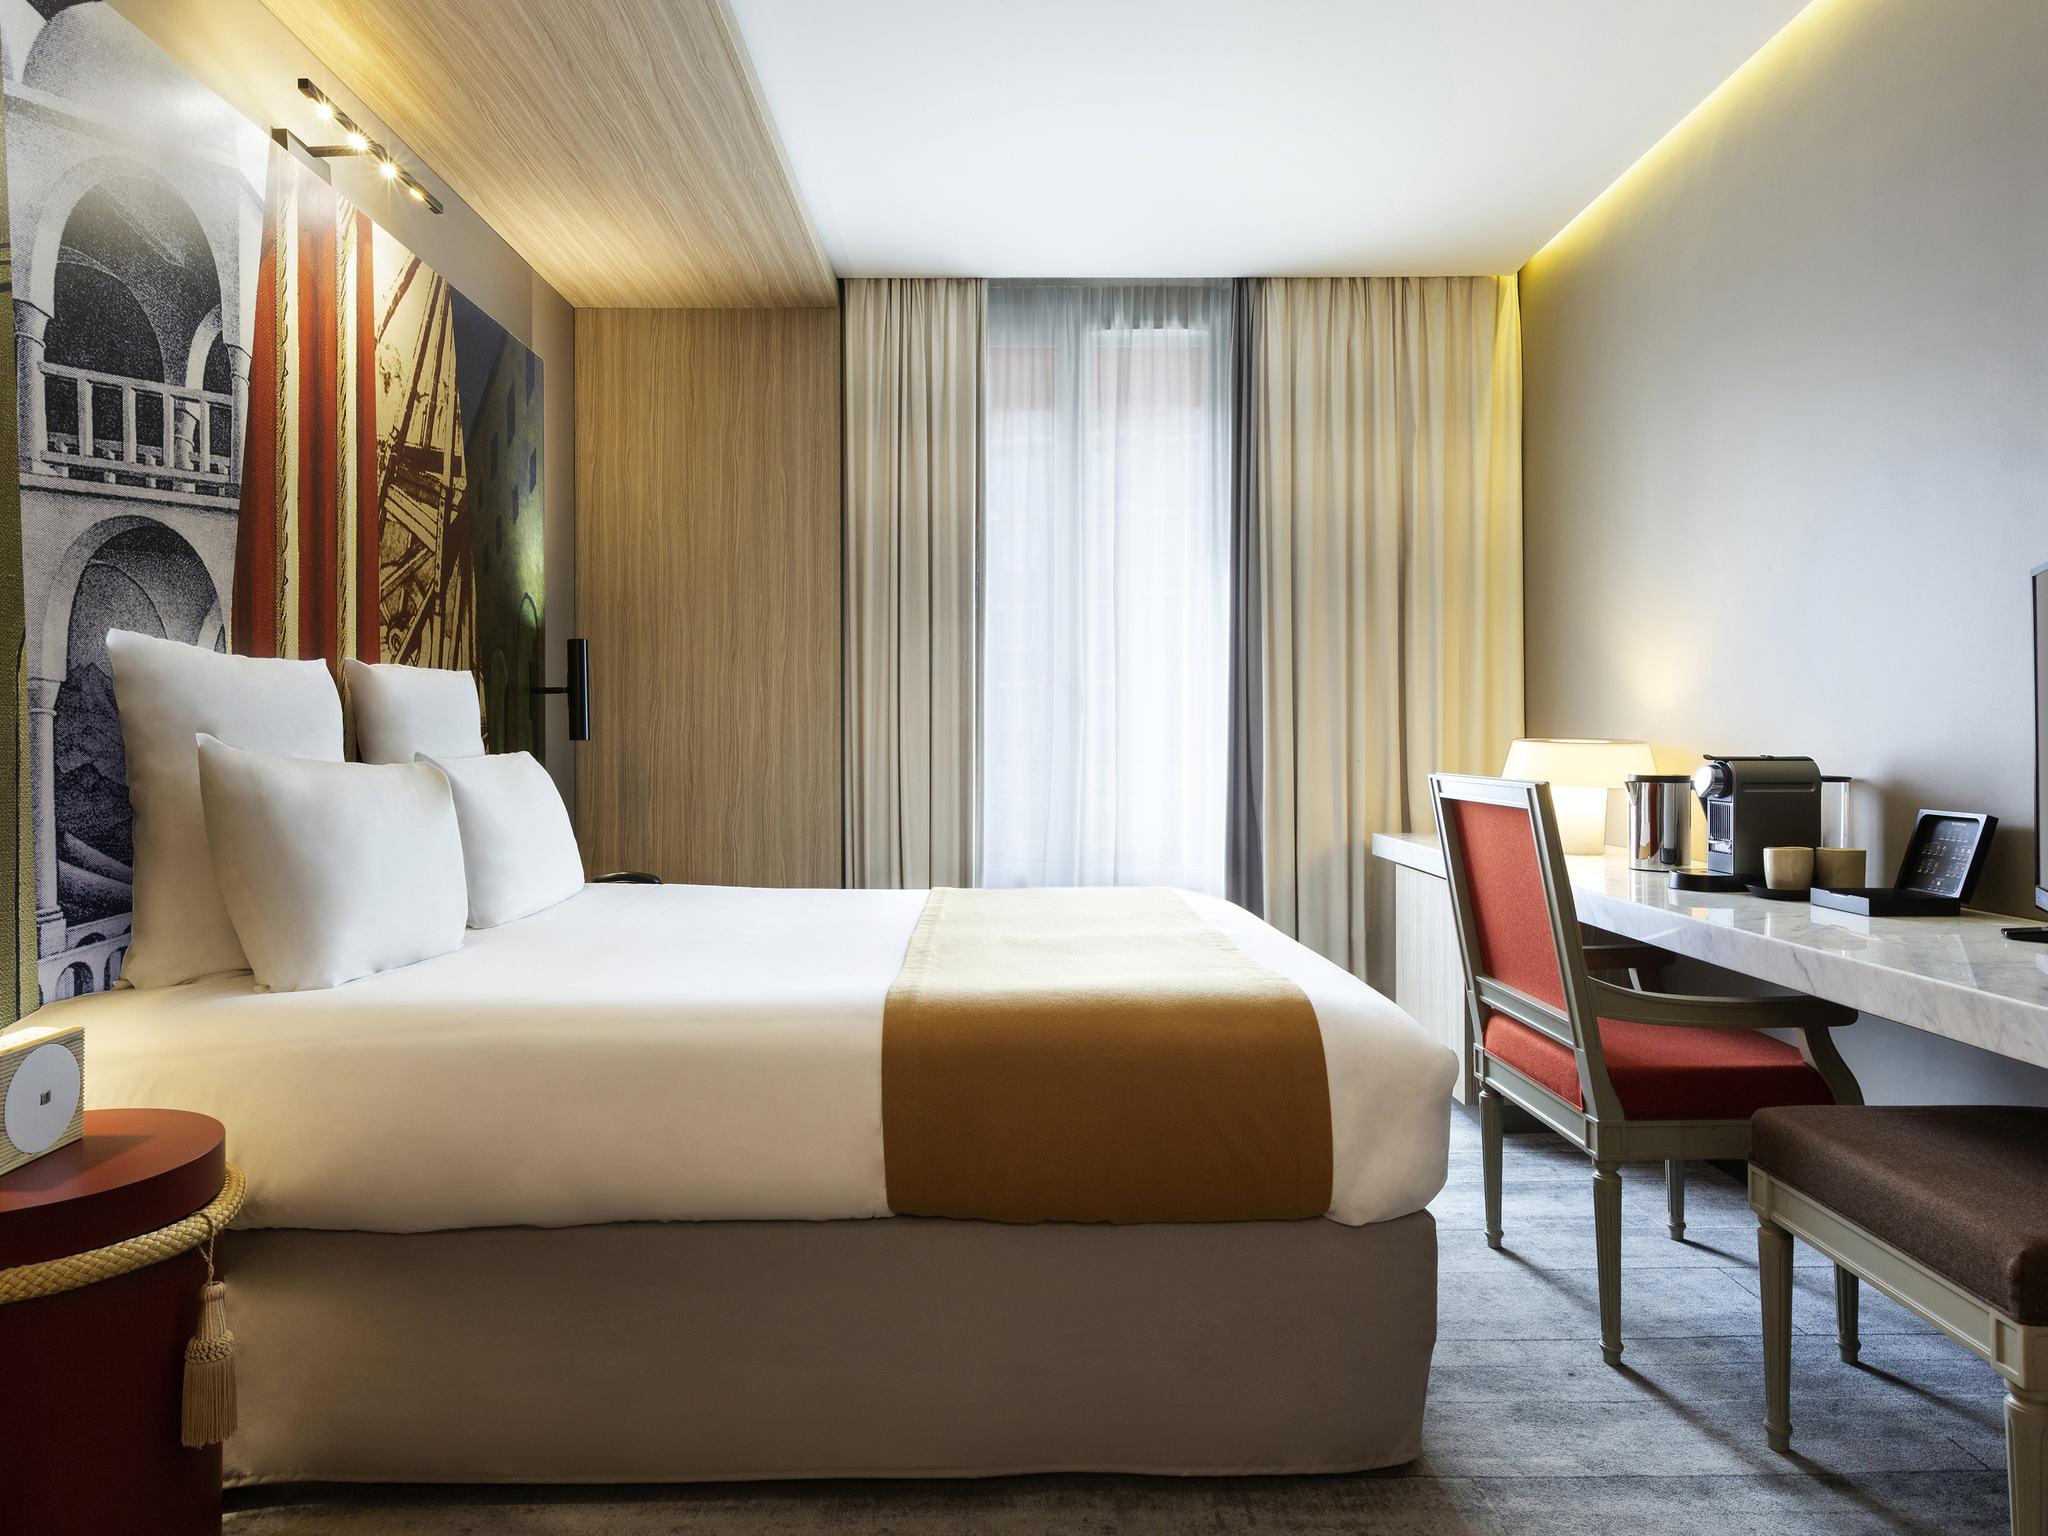 Hotel - Mercure Paris Alesia hotel